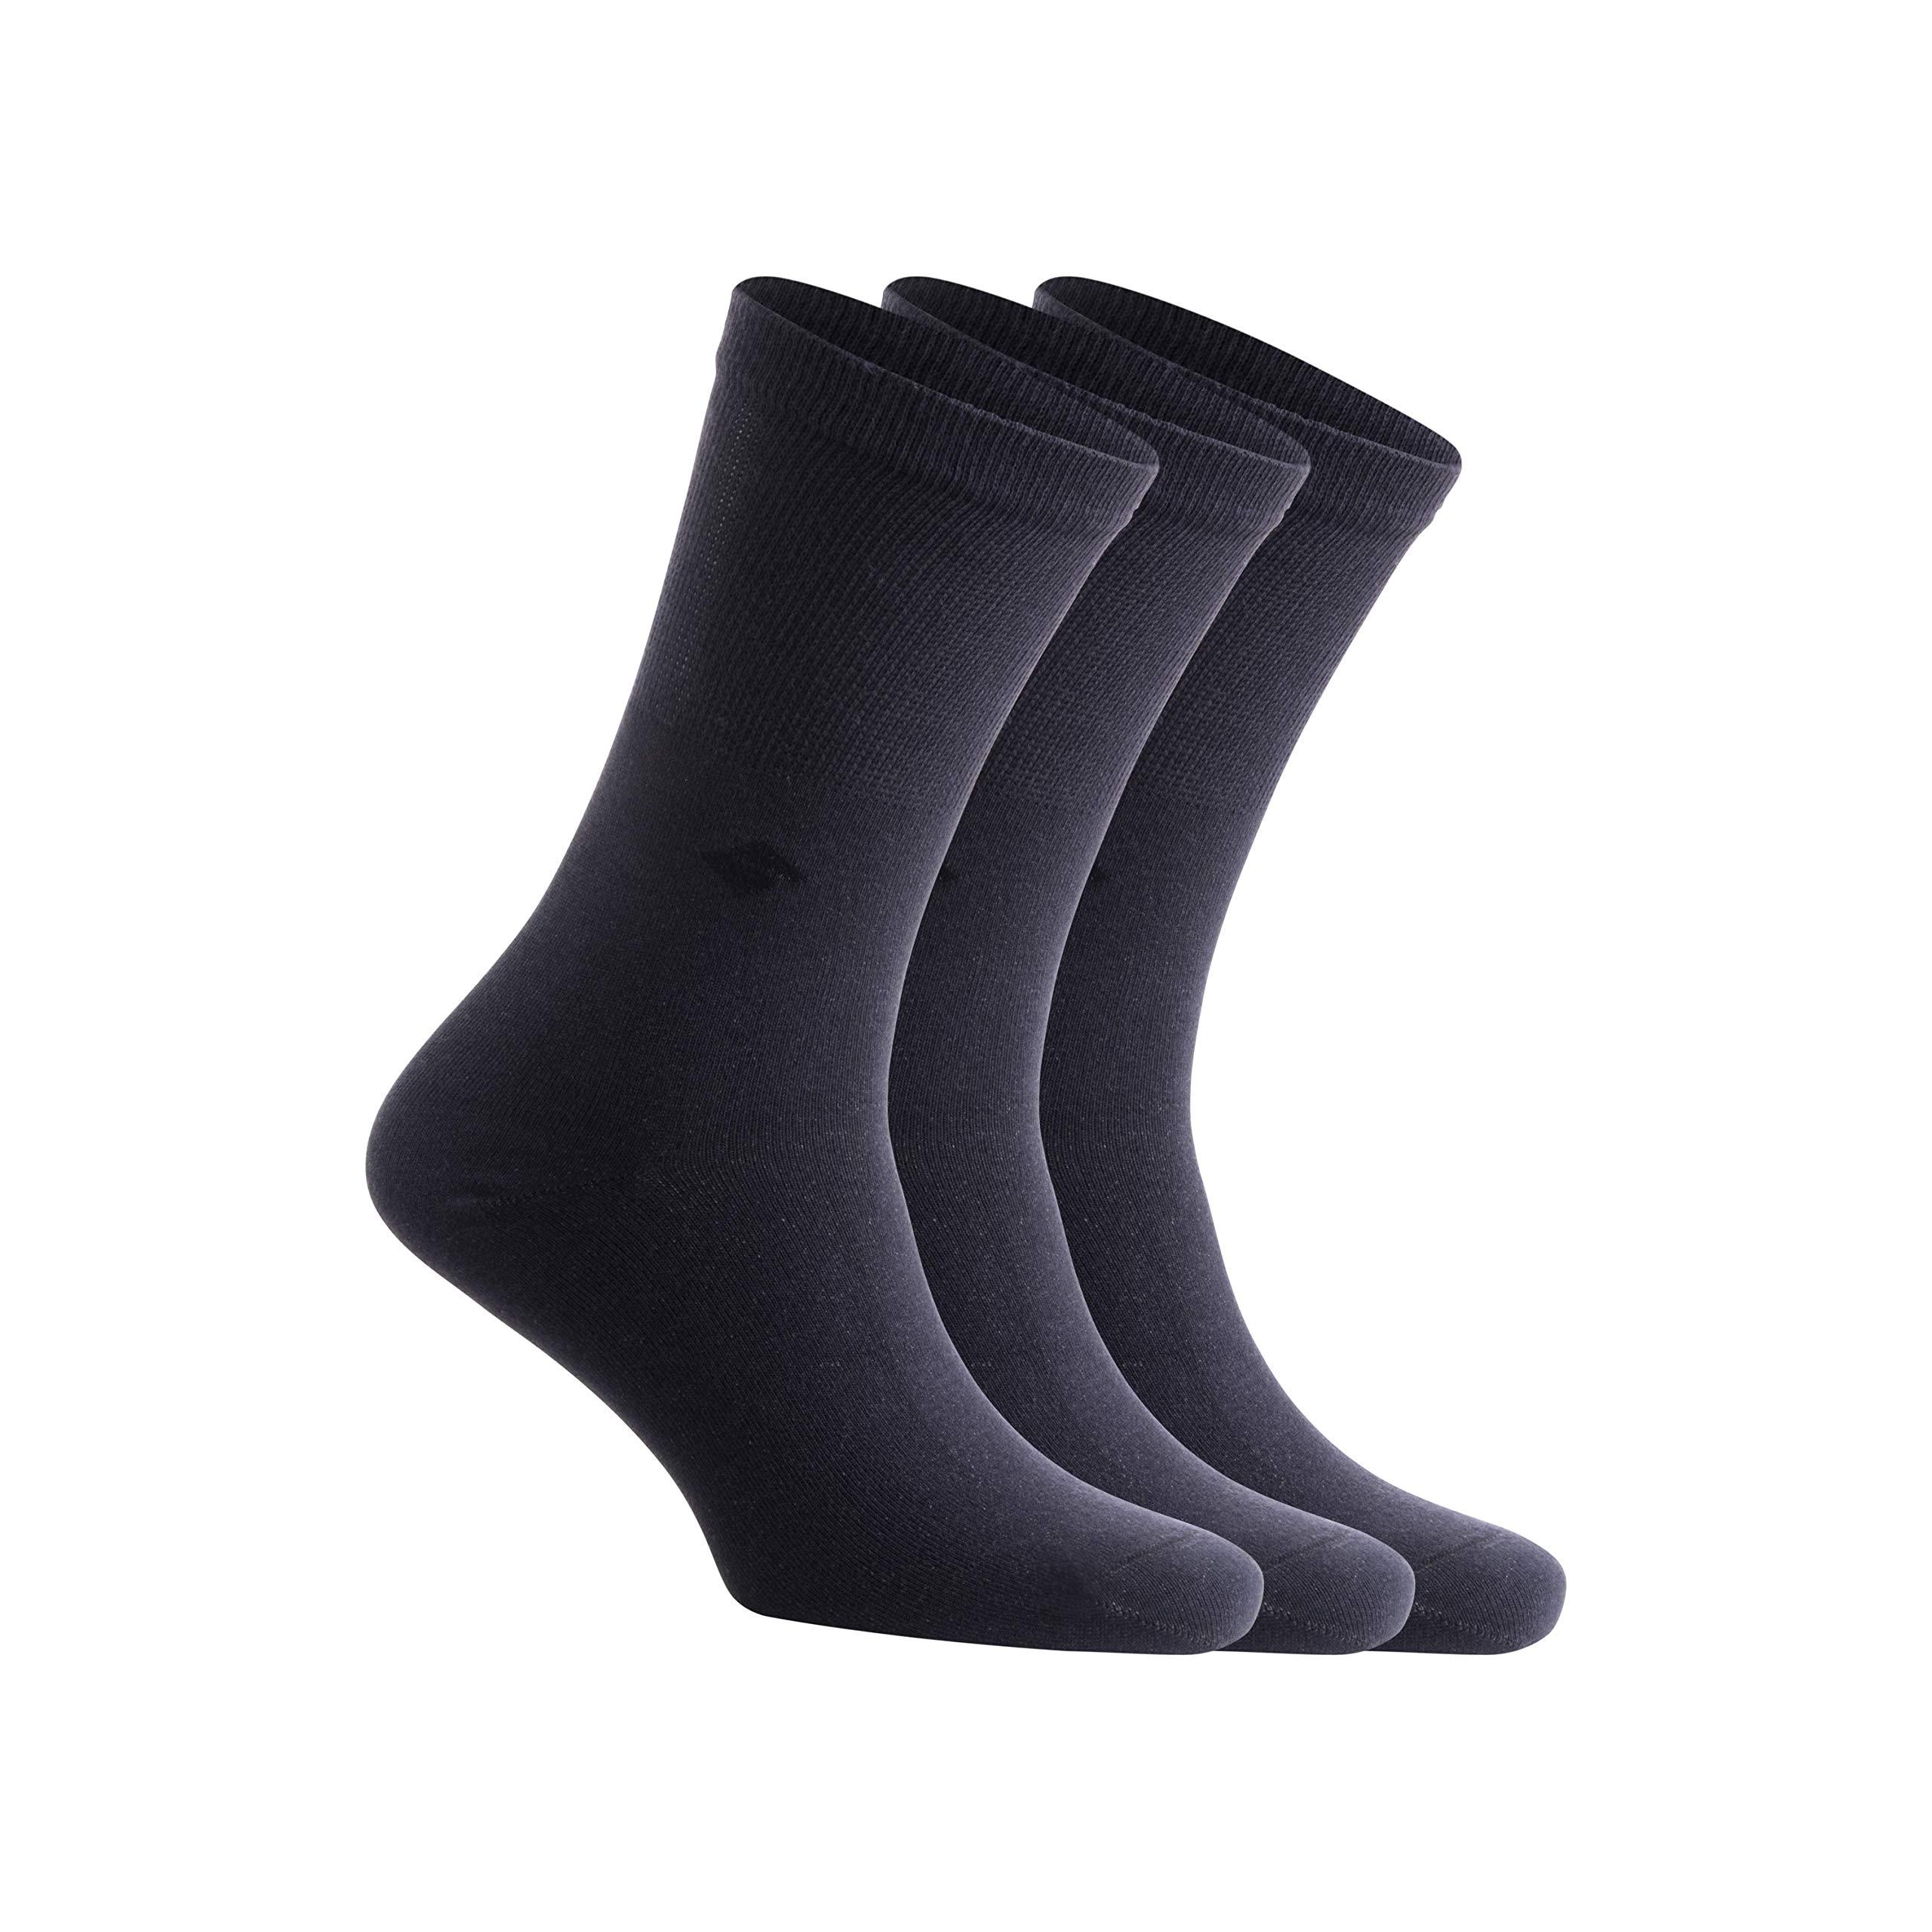 Best Buy 13% Pure Silver Socks Anti-Odor Antibacterial Anti-fungal Crew Dress Socks by Bonny Silver Reviews